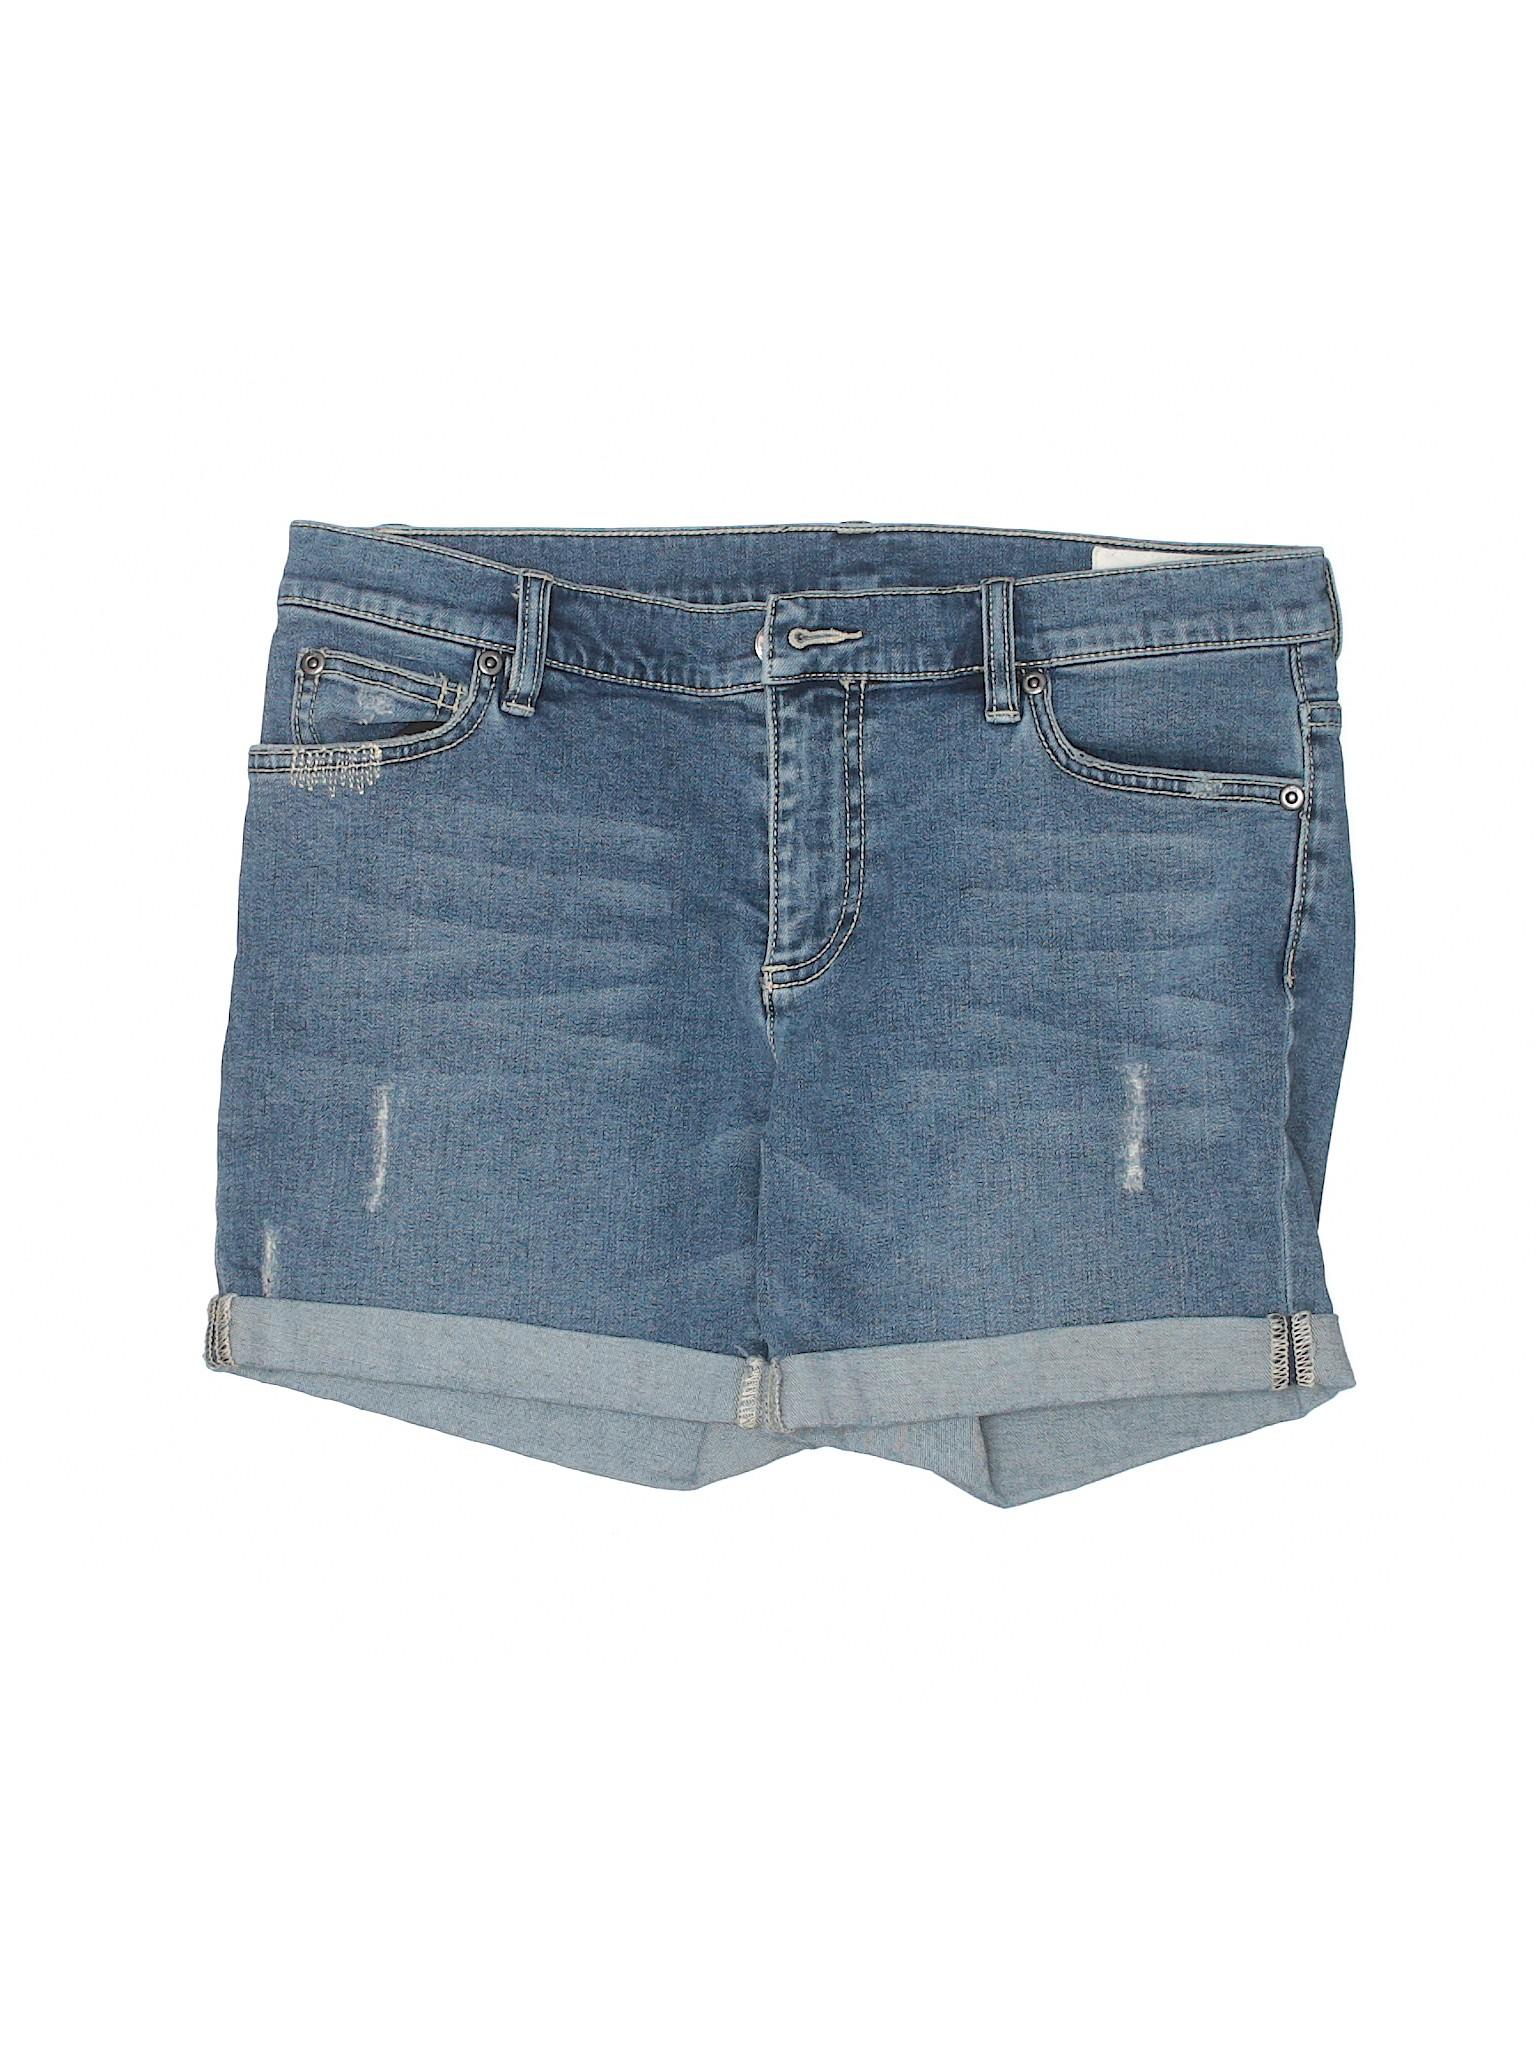 Camuto by Shorts Denim Vince TWO Boutique UpWqTnt4W